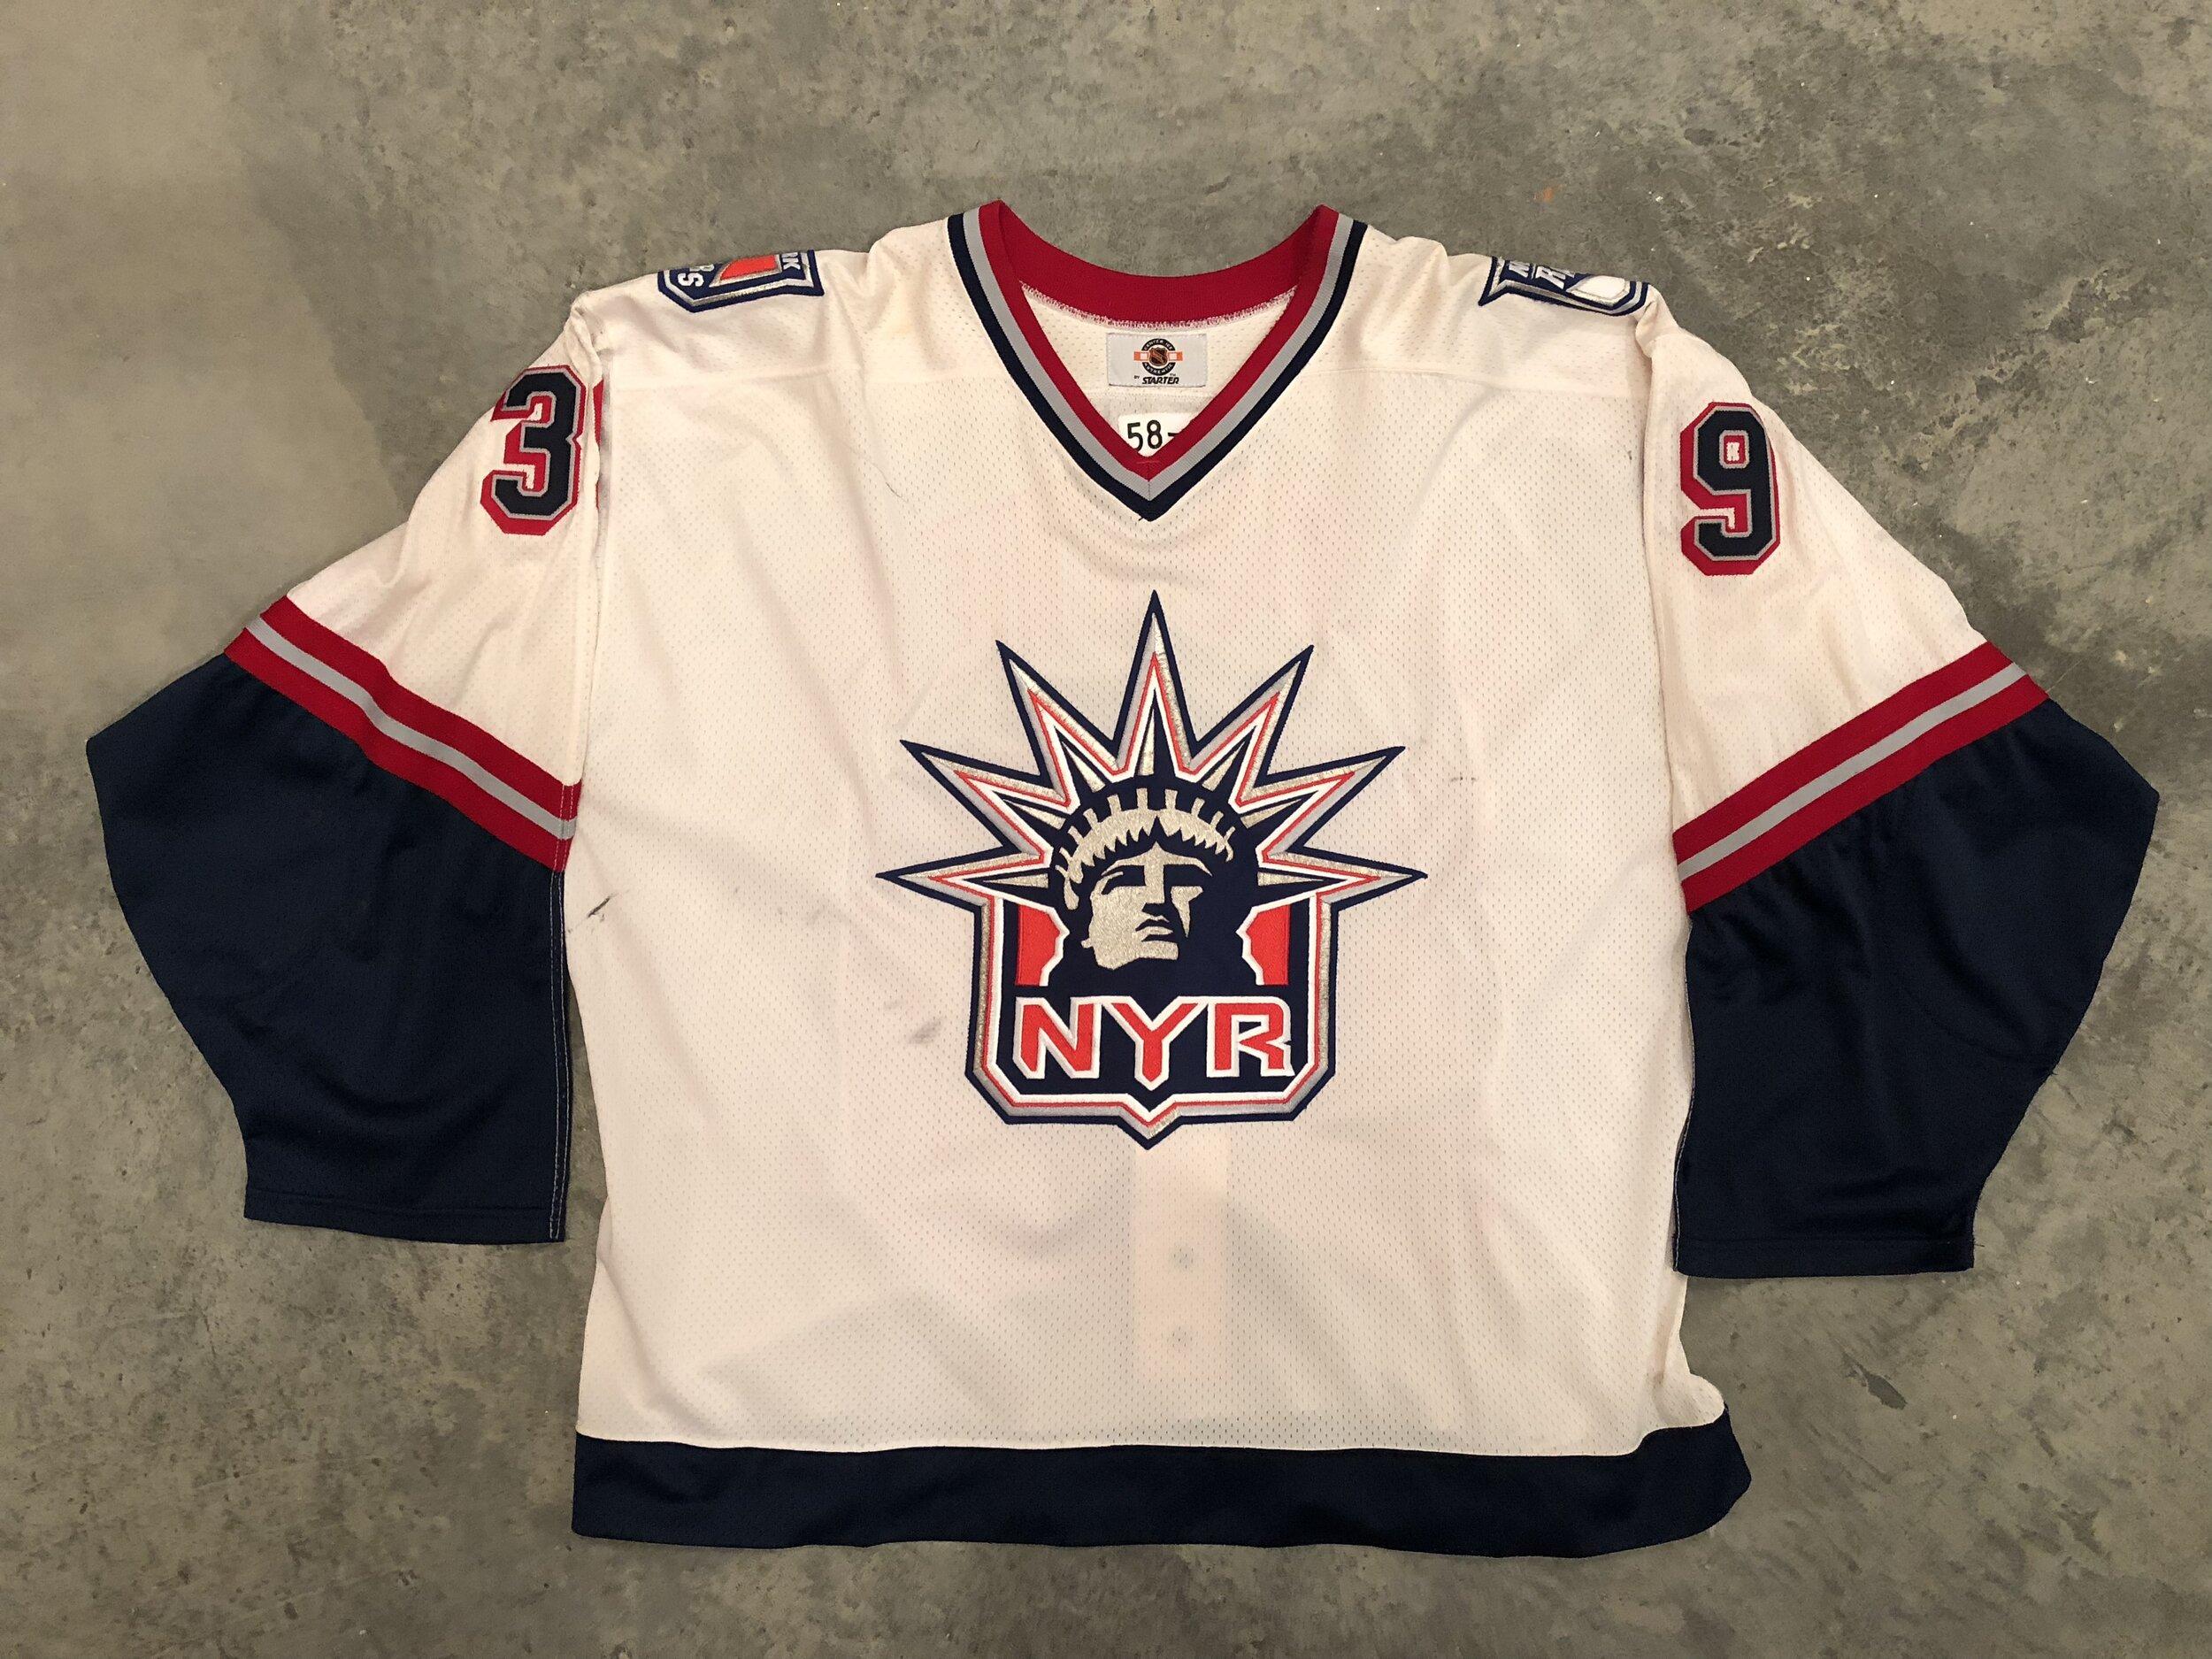 1998-99 Dan Cloutier New York Rangers White Liberty Game Worn Jersey